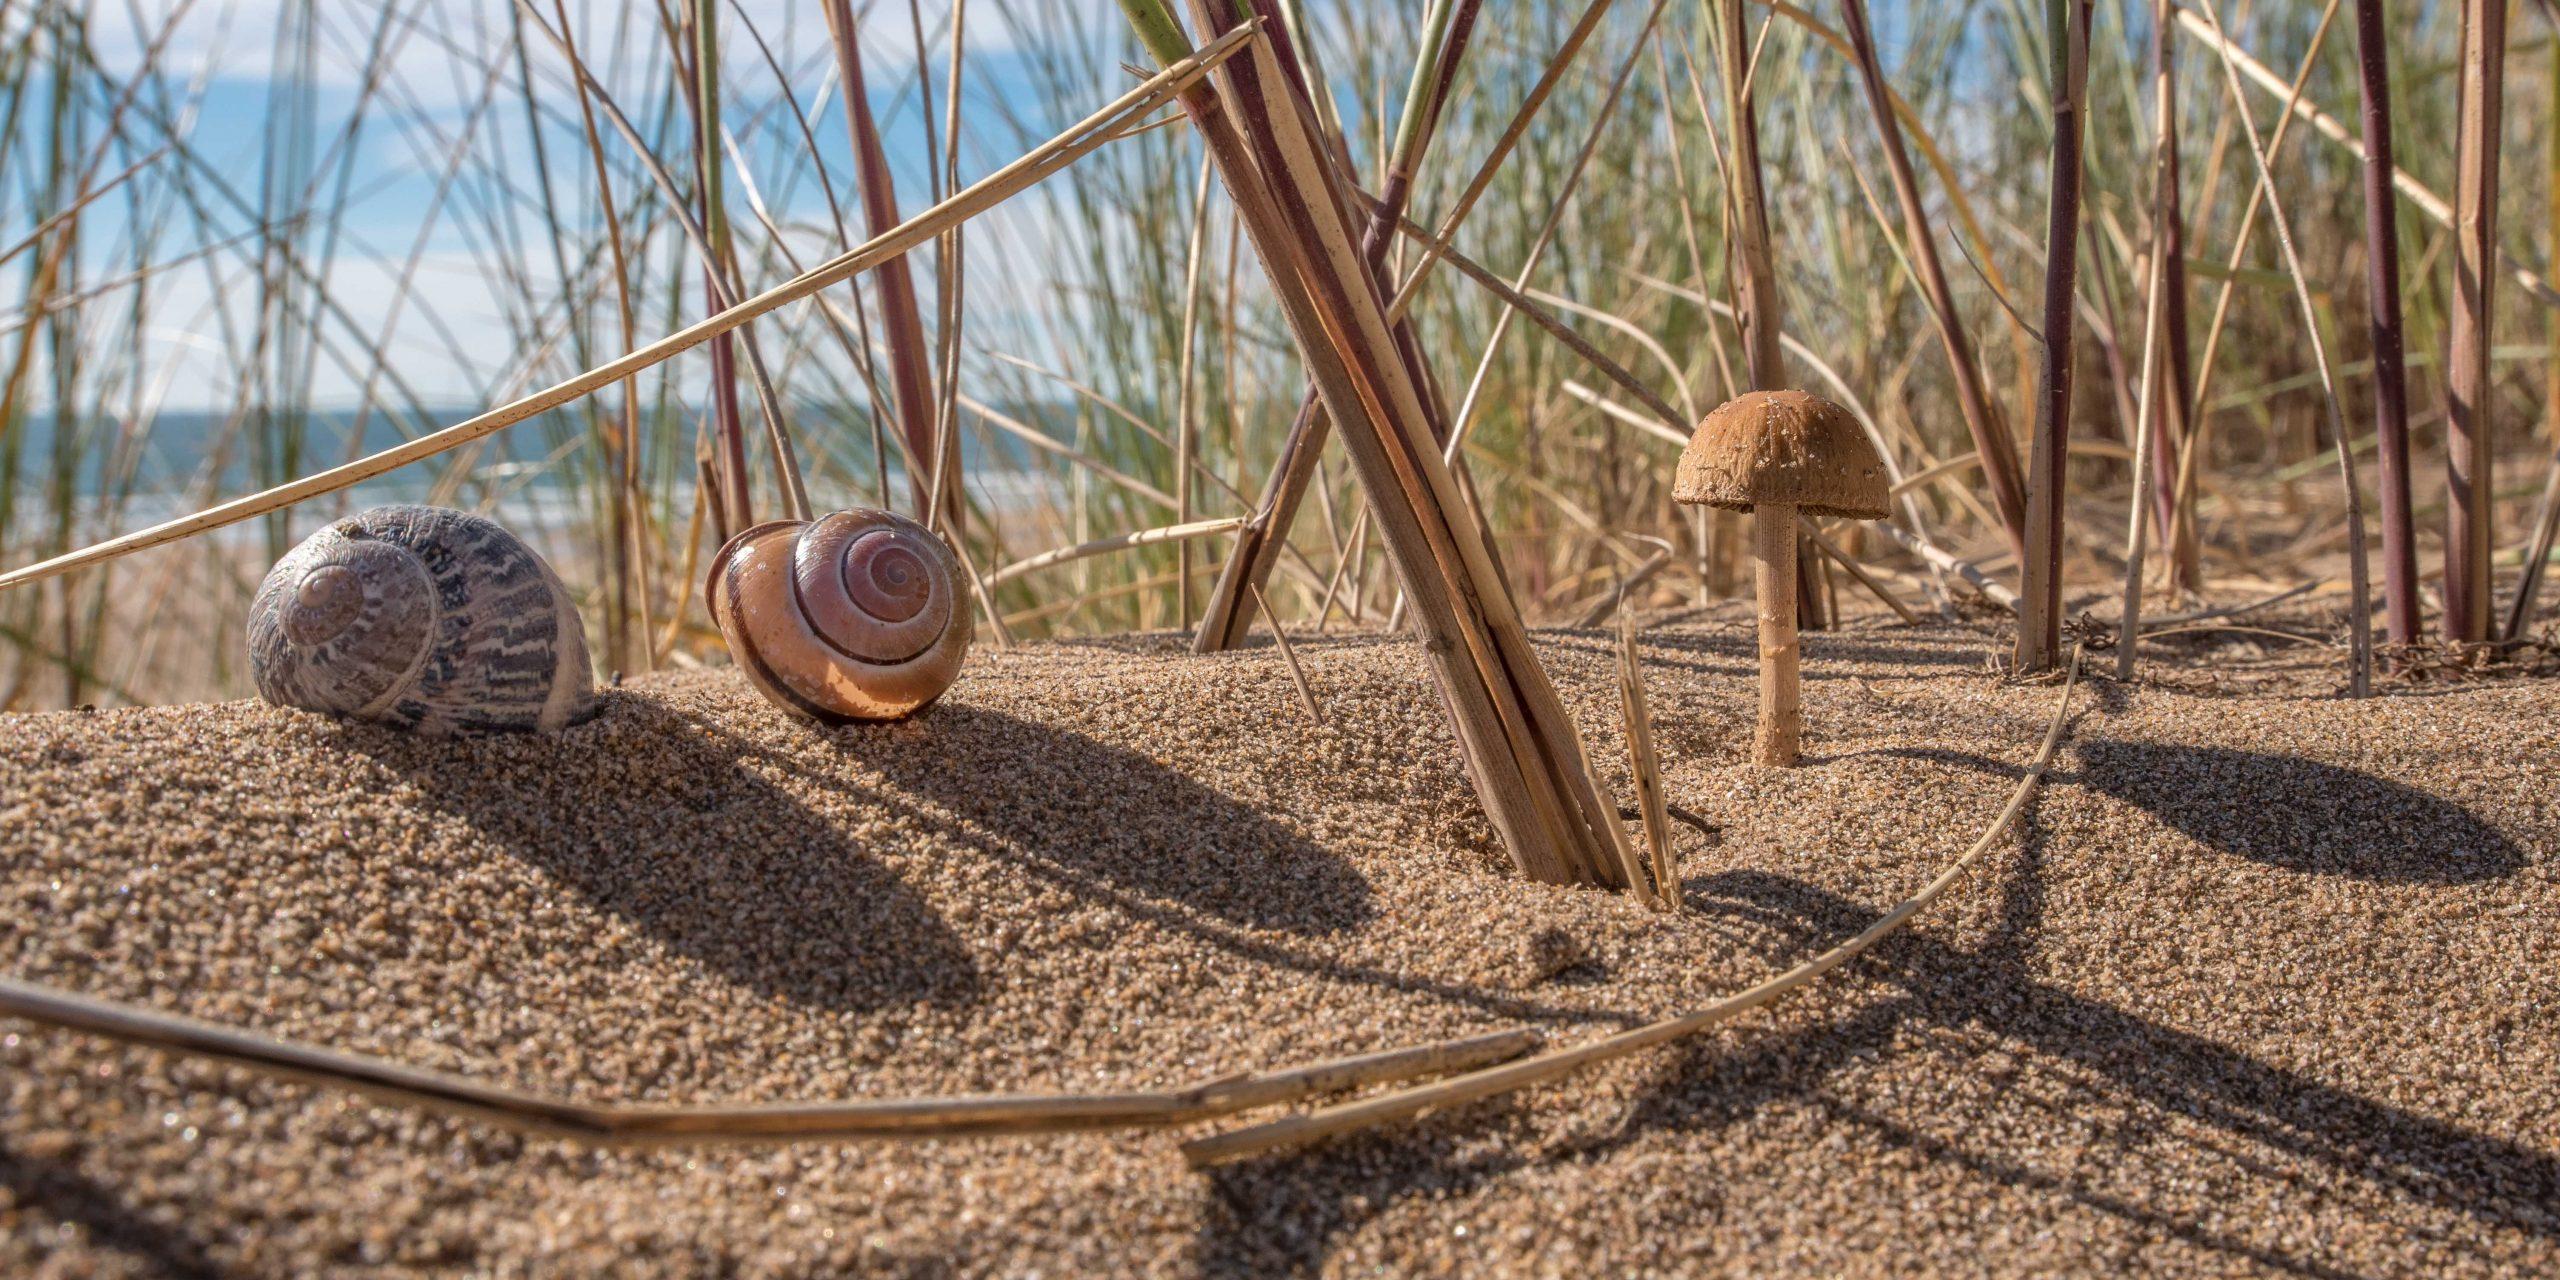 Dune Mushroom with Shells